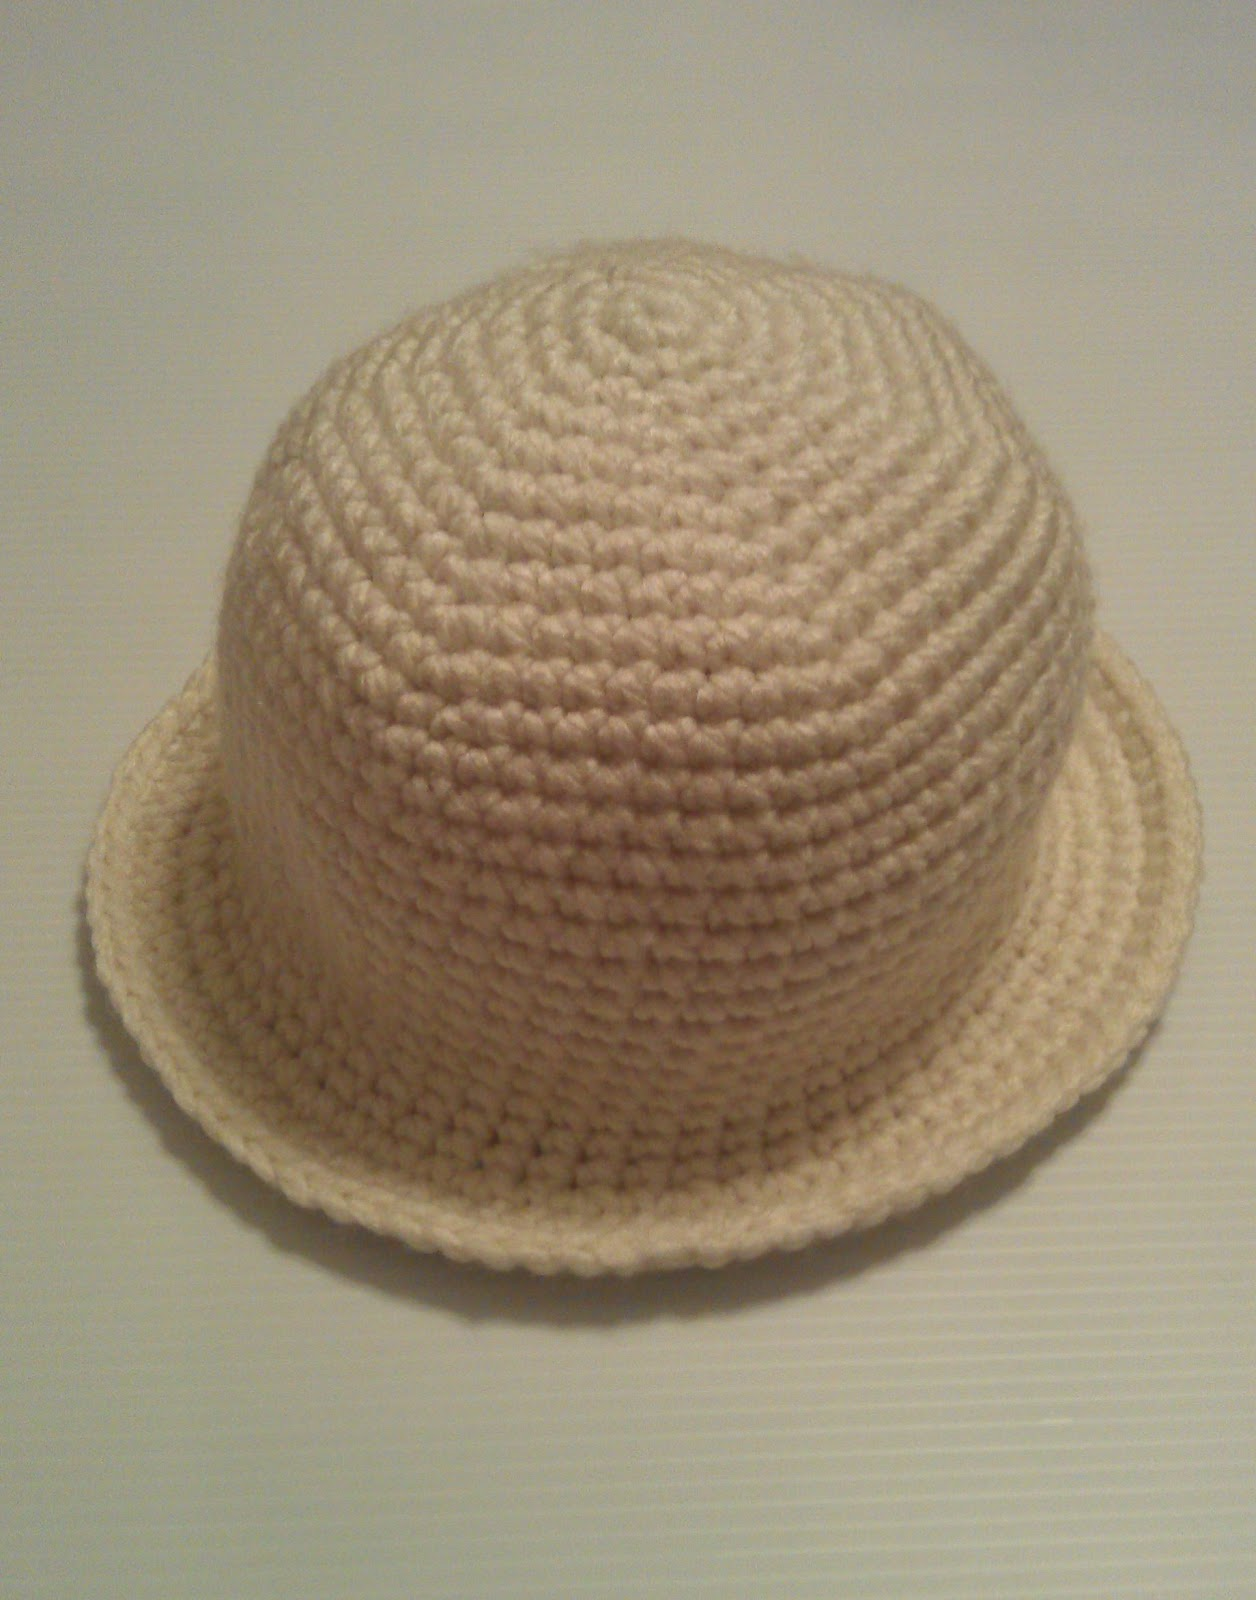 Mini Brim Hat: Free Crochet Pattern - Artsy Daisy Crochet